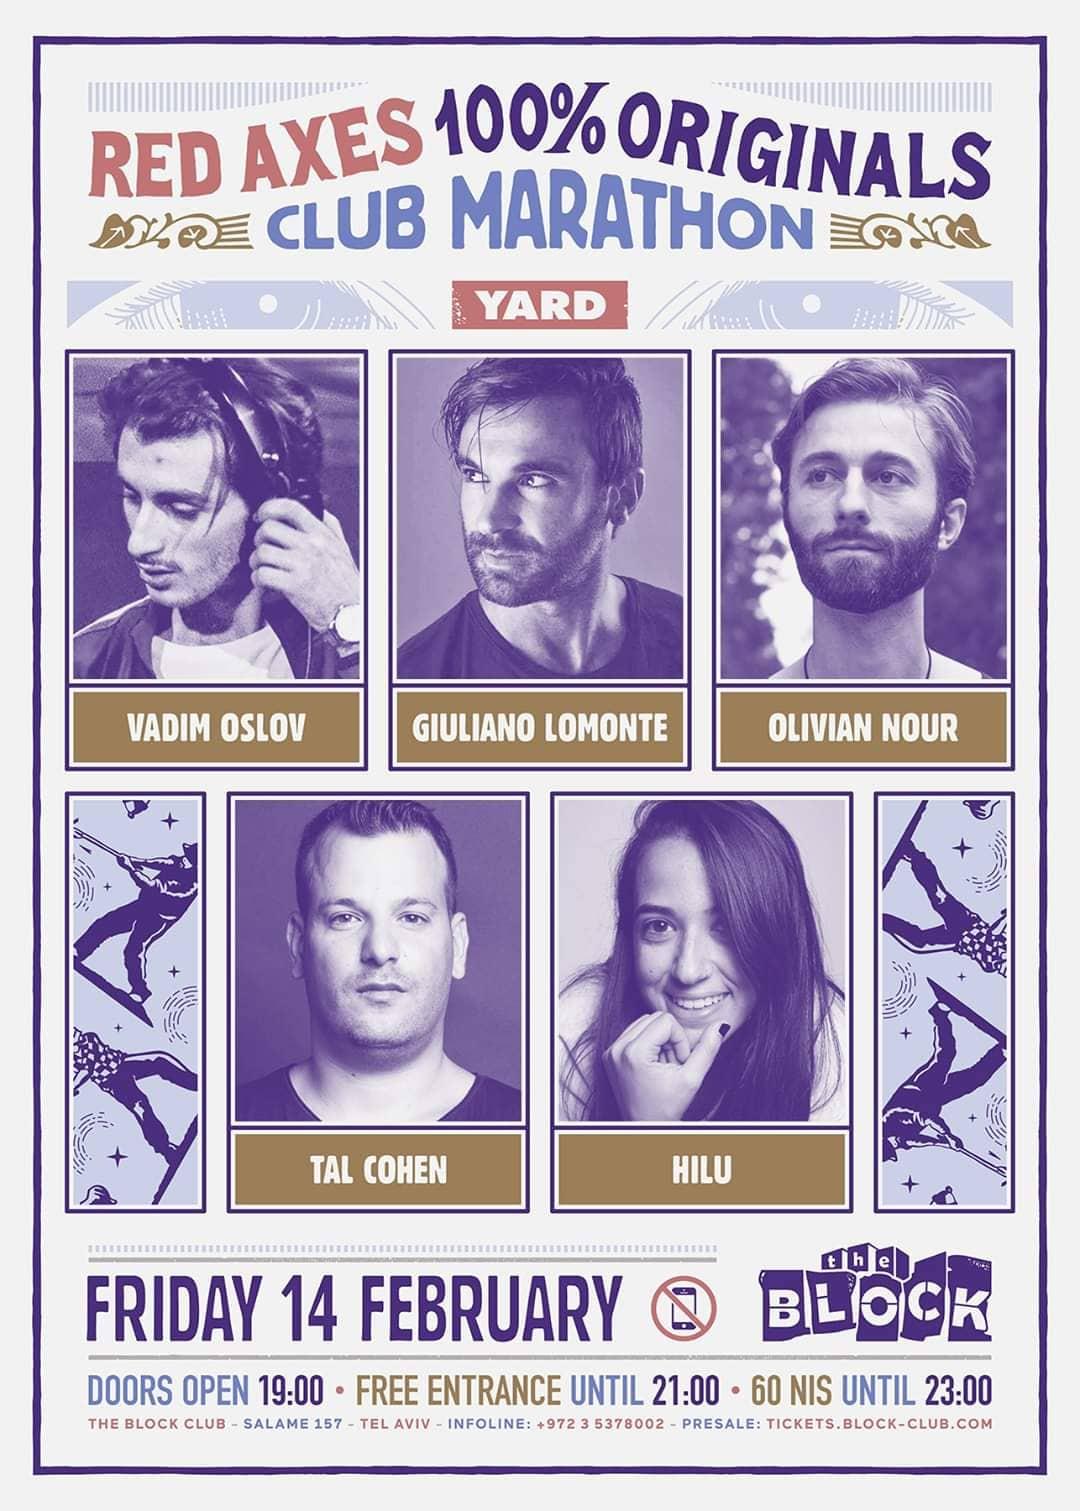 100% Originals Club Marathon, Friday February 14 at The Block